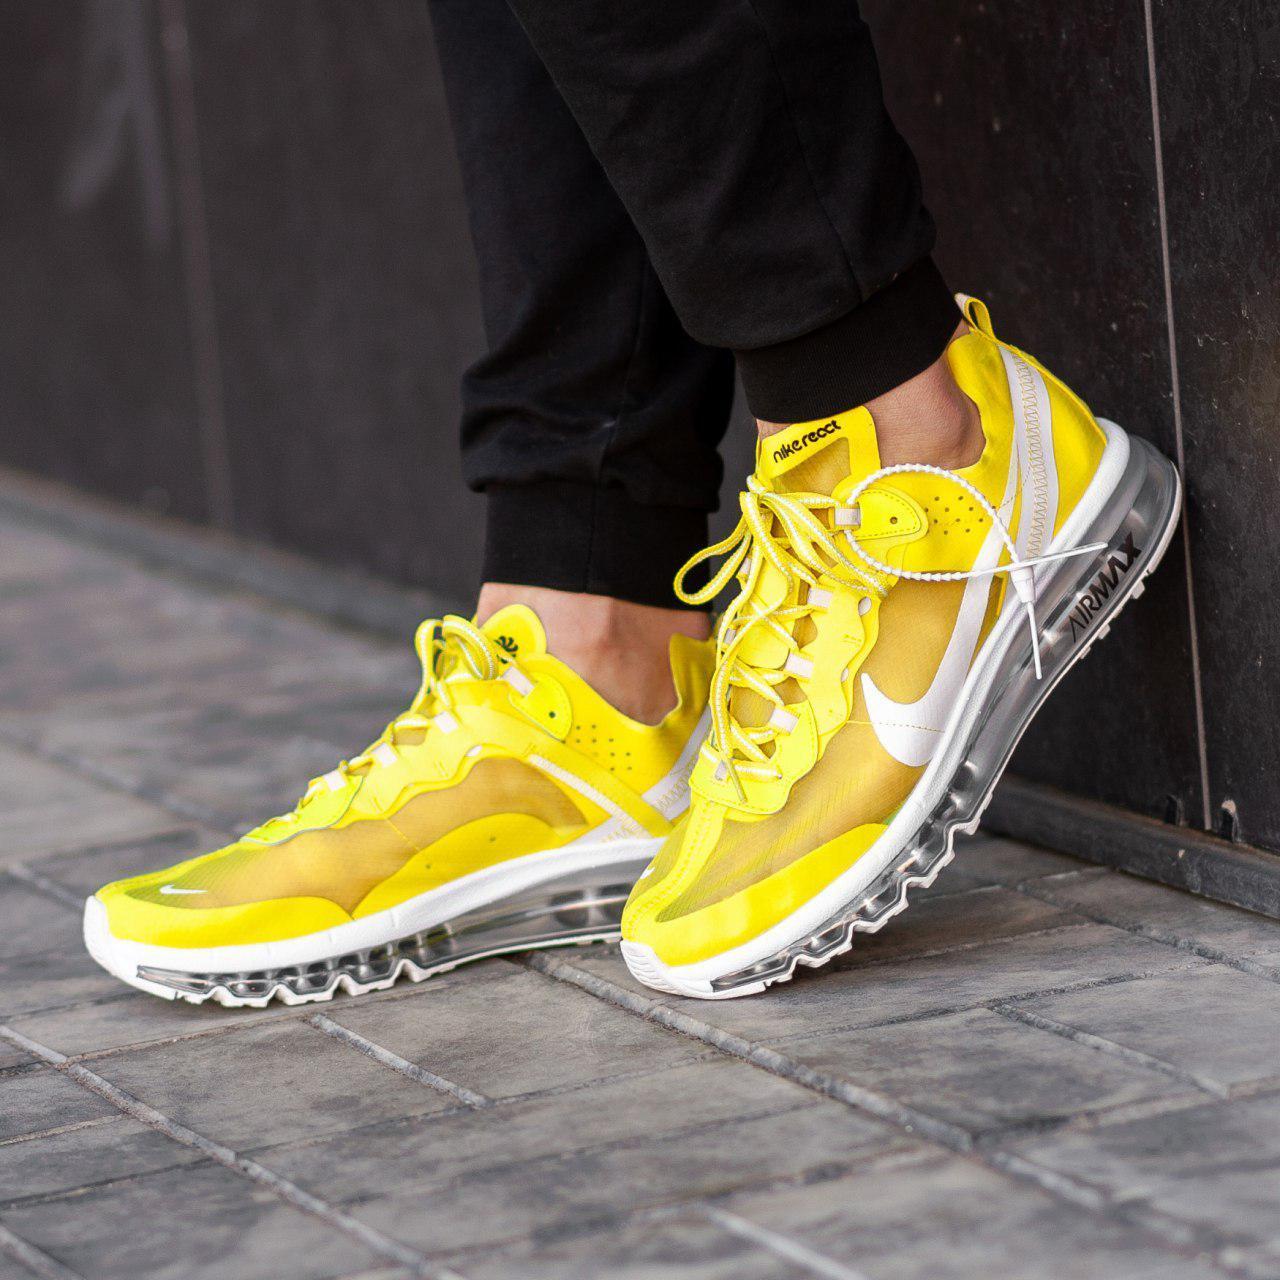 new concept af113 eba46 Nike Air Max 2017 x React Element 87 Yellow   кроссовки мужские; летние;  желтые - Bigl.ua